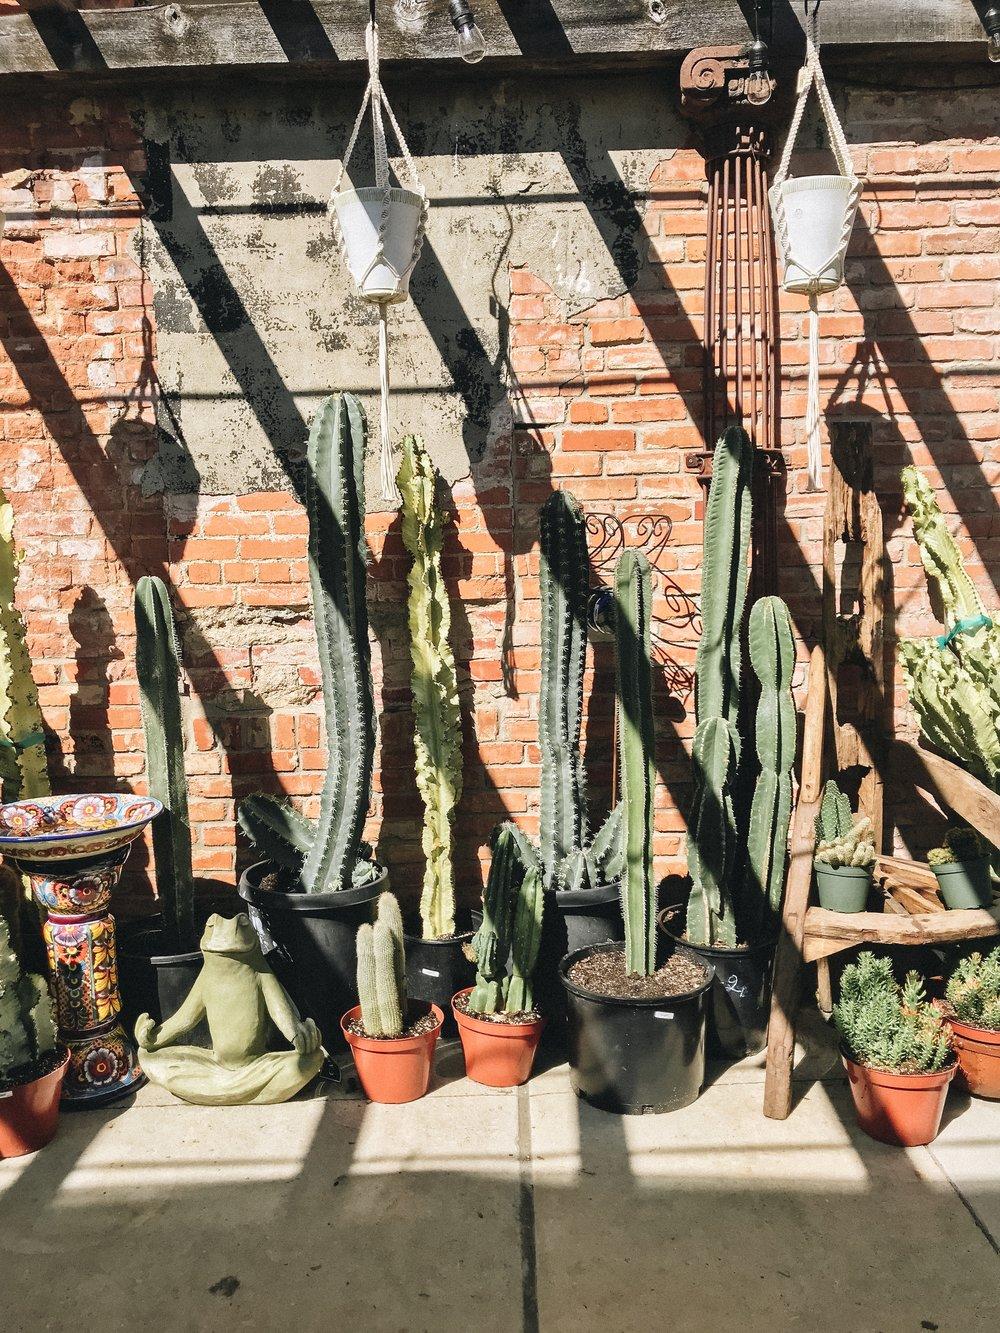 Best Plant Shops in Dallas | Ruibal's